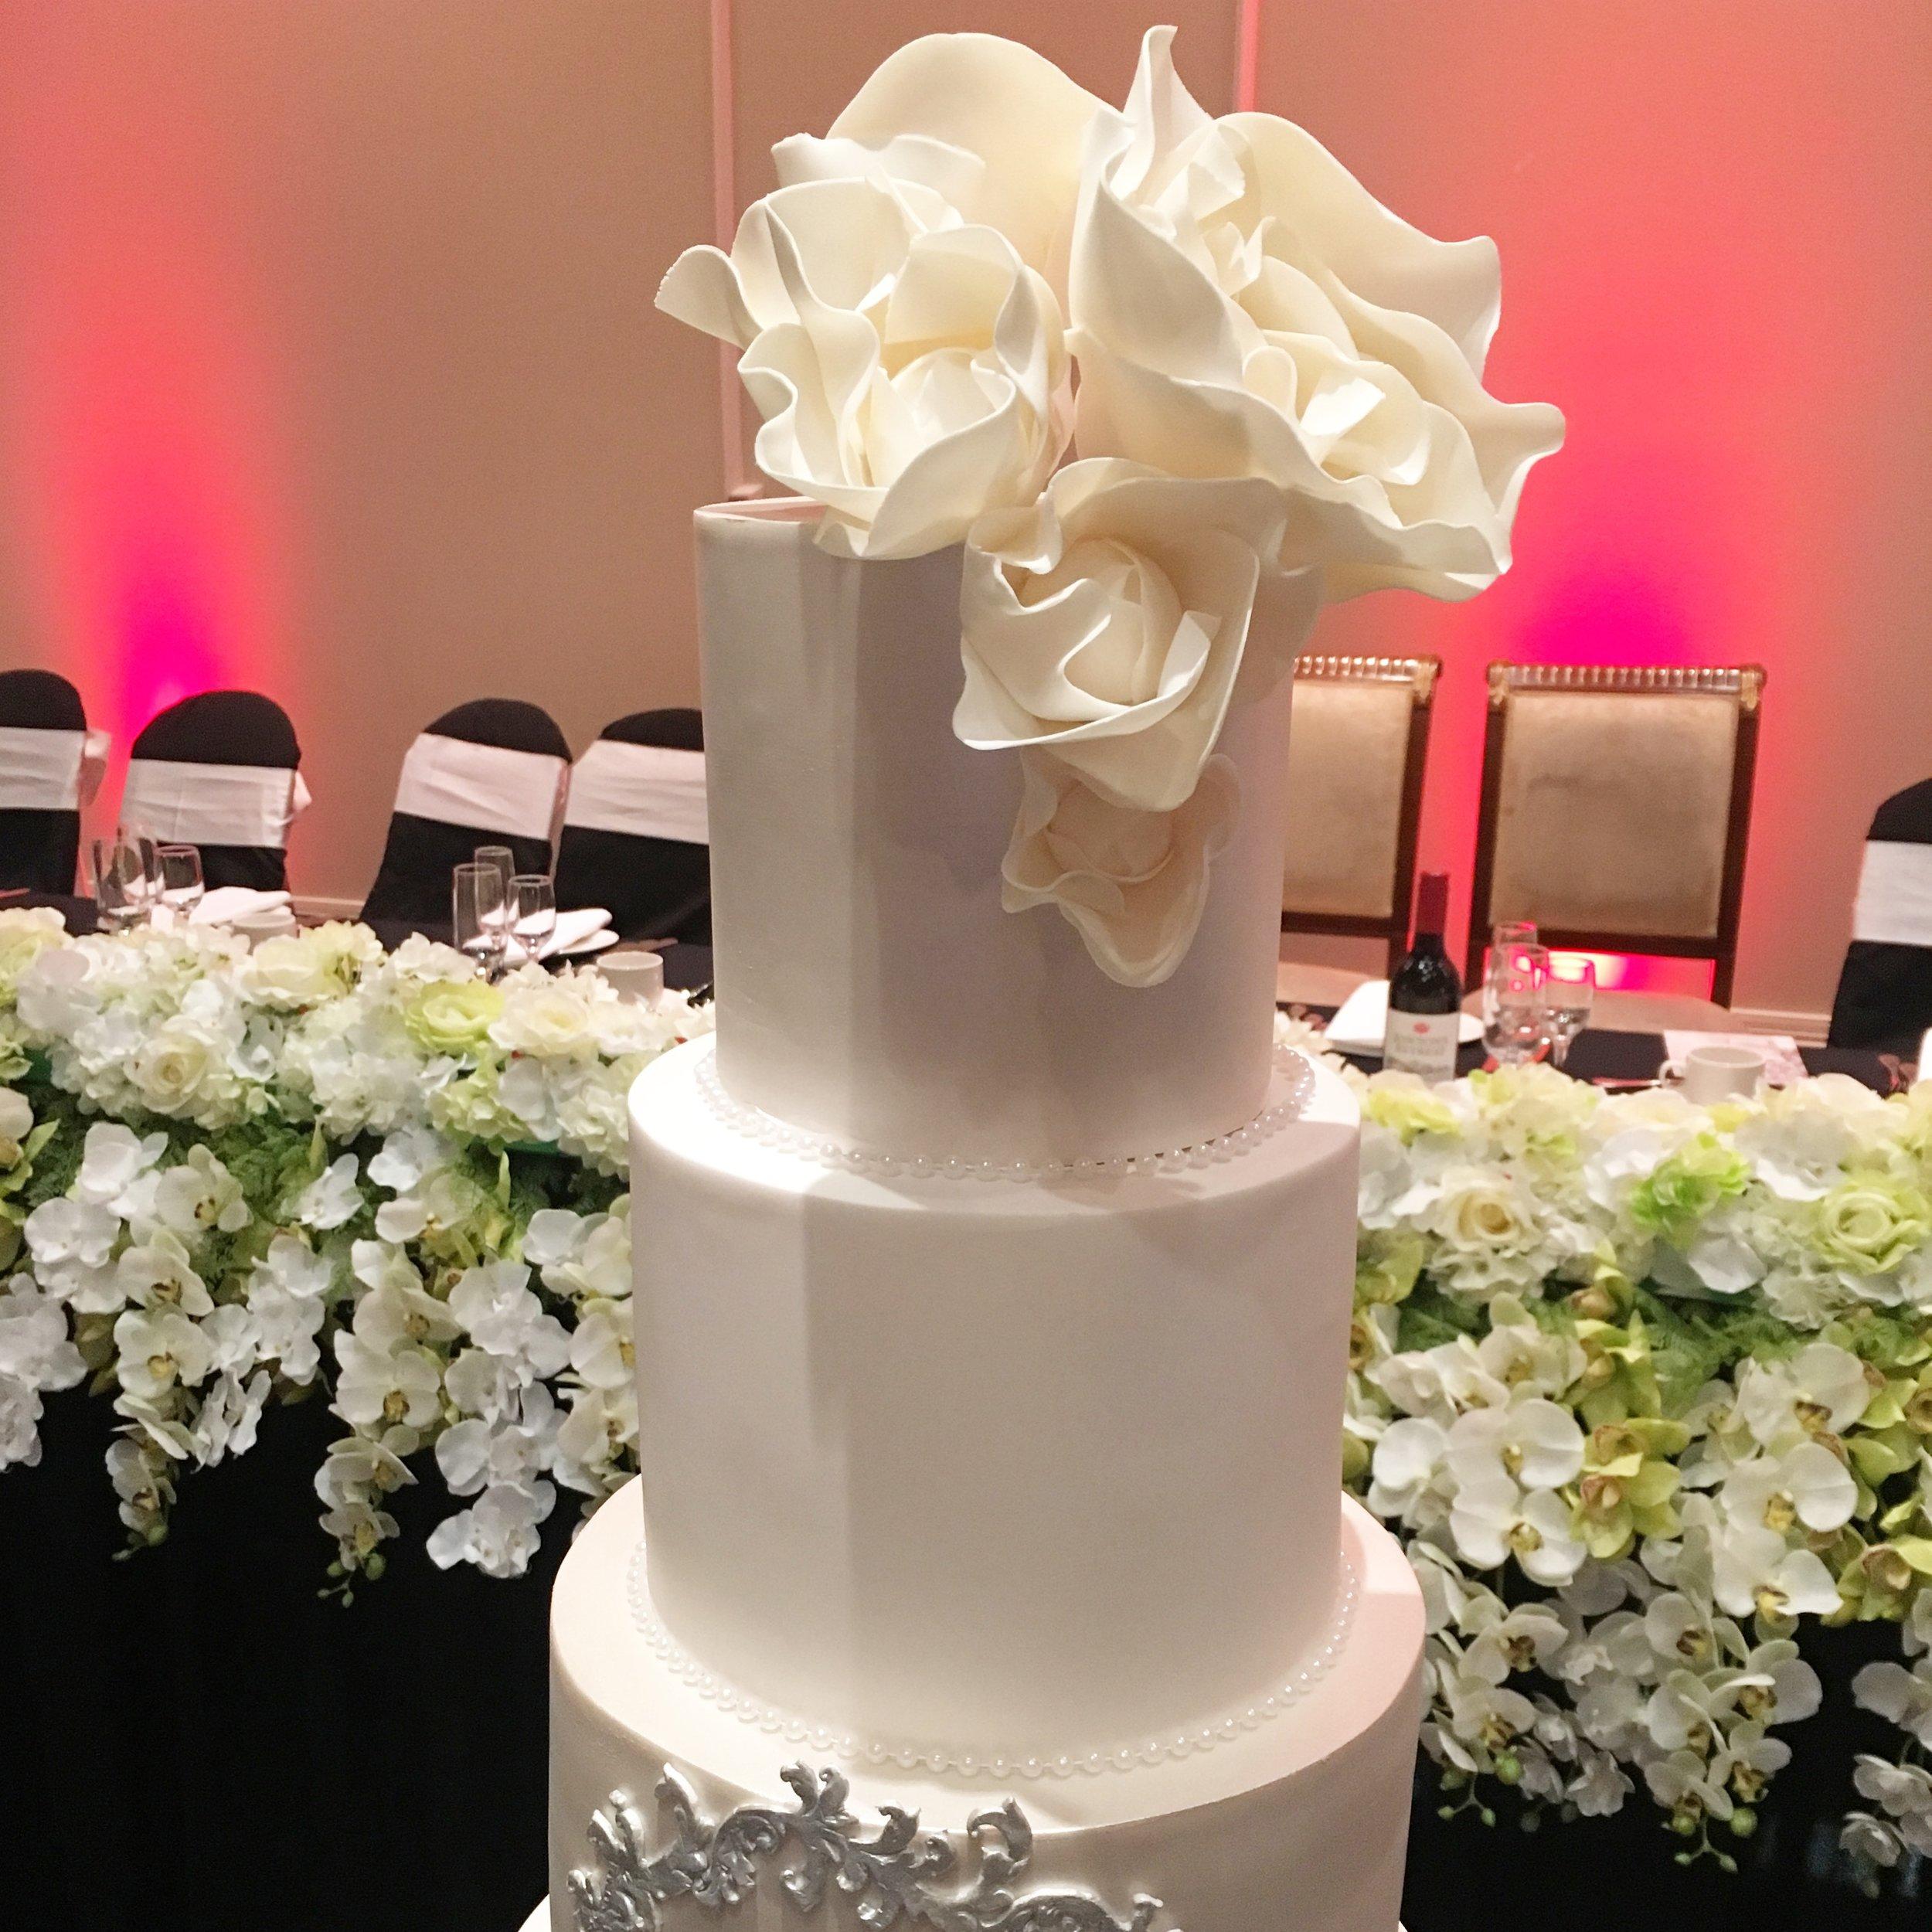 Sugar Flowers on Large Wedding Cake